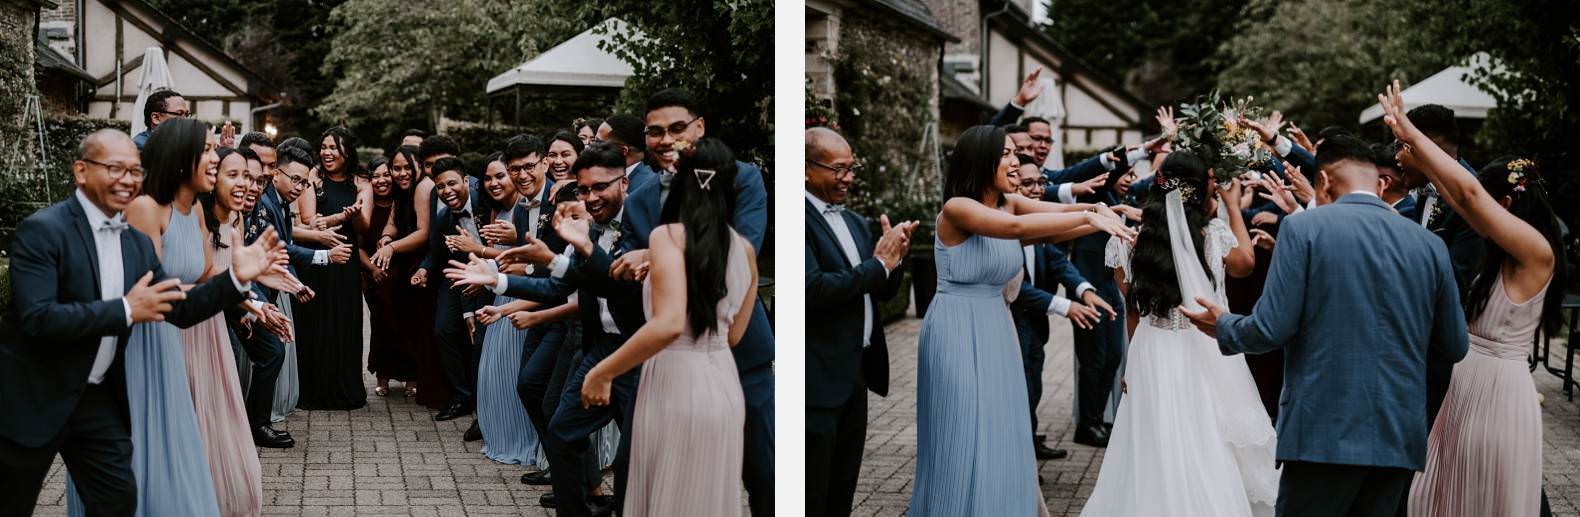 mariage manoir de corny photographe bel esprit 0063